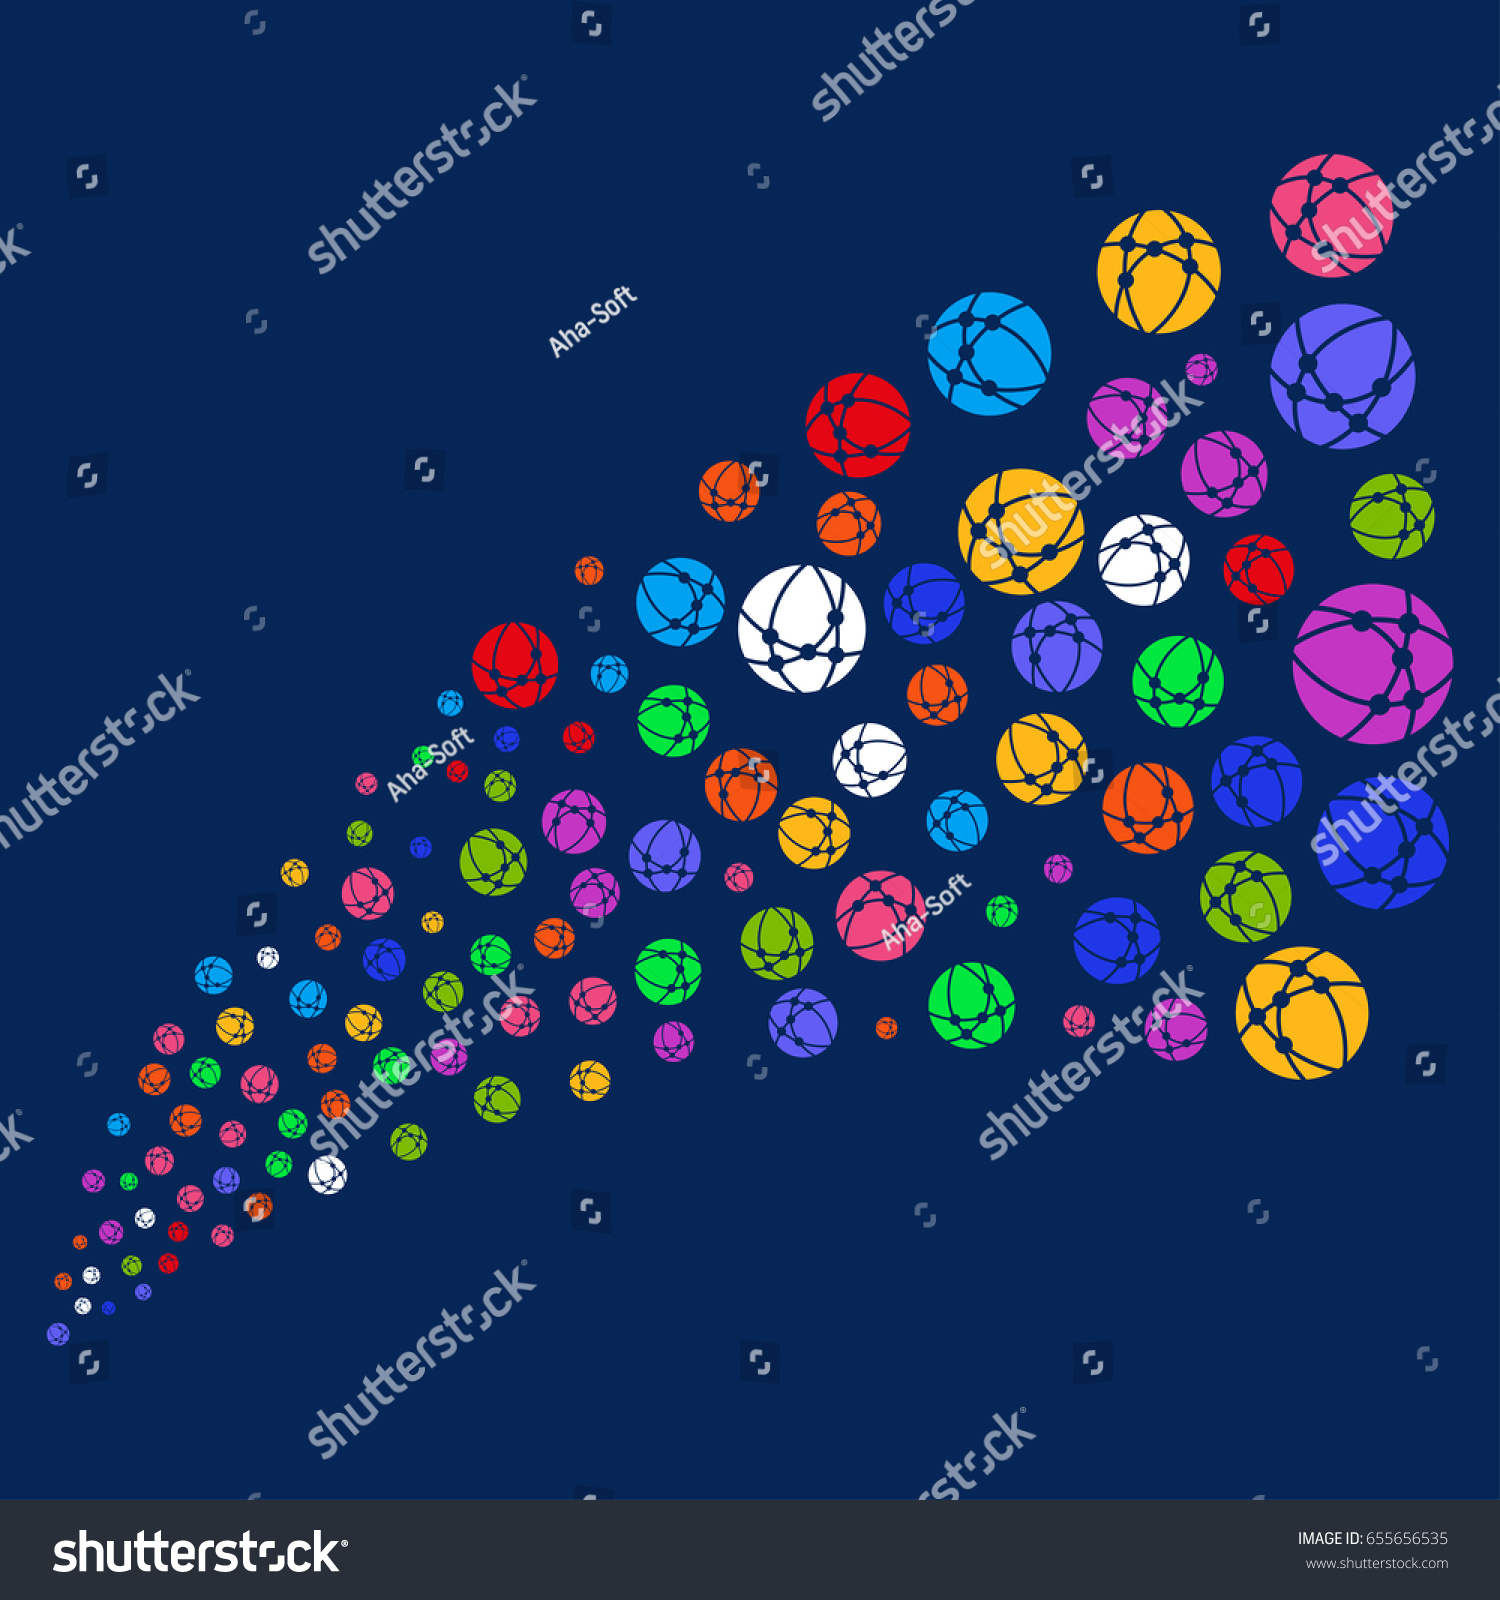 Fountain Web Browser Symbols Vector Illustration Stock Vector